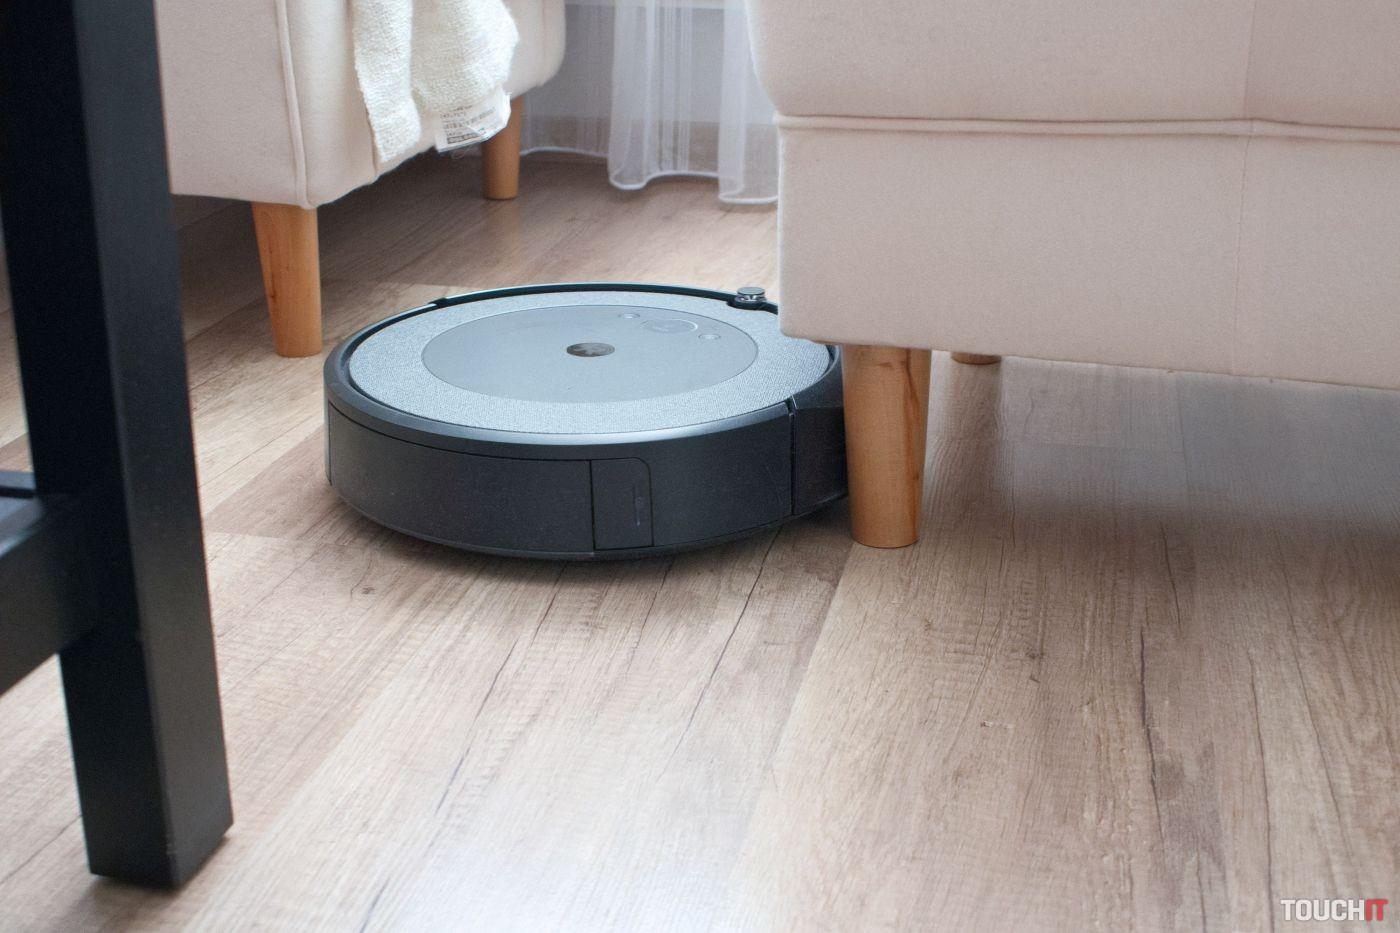 iRobot Roomba i3+